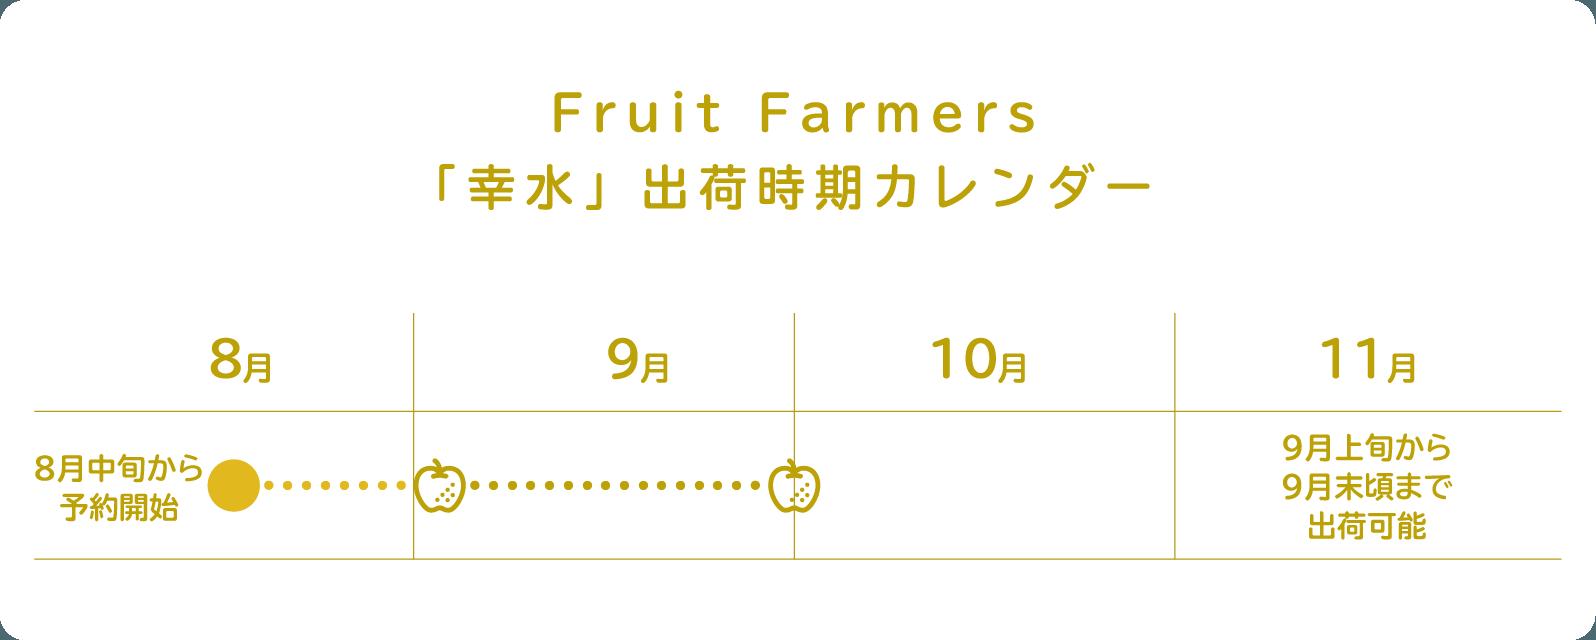 Fruit Farmers「幸水」出荷時期カレンダー